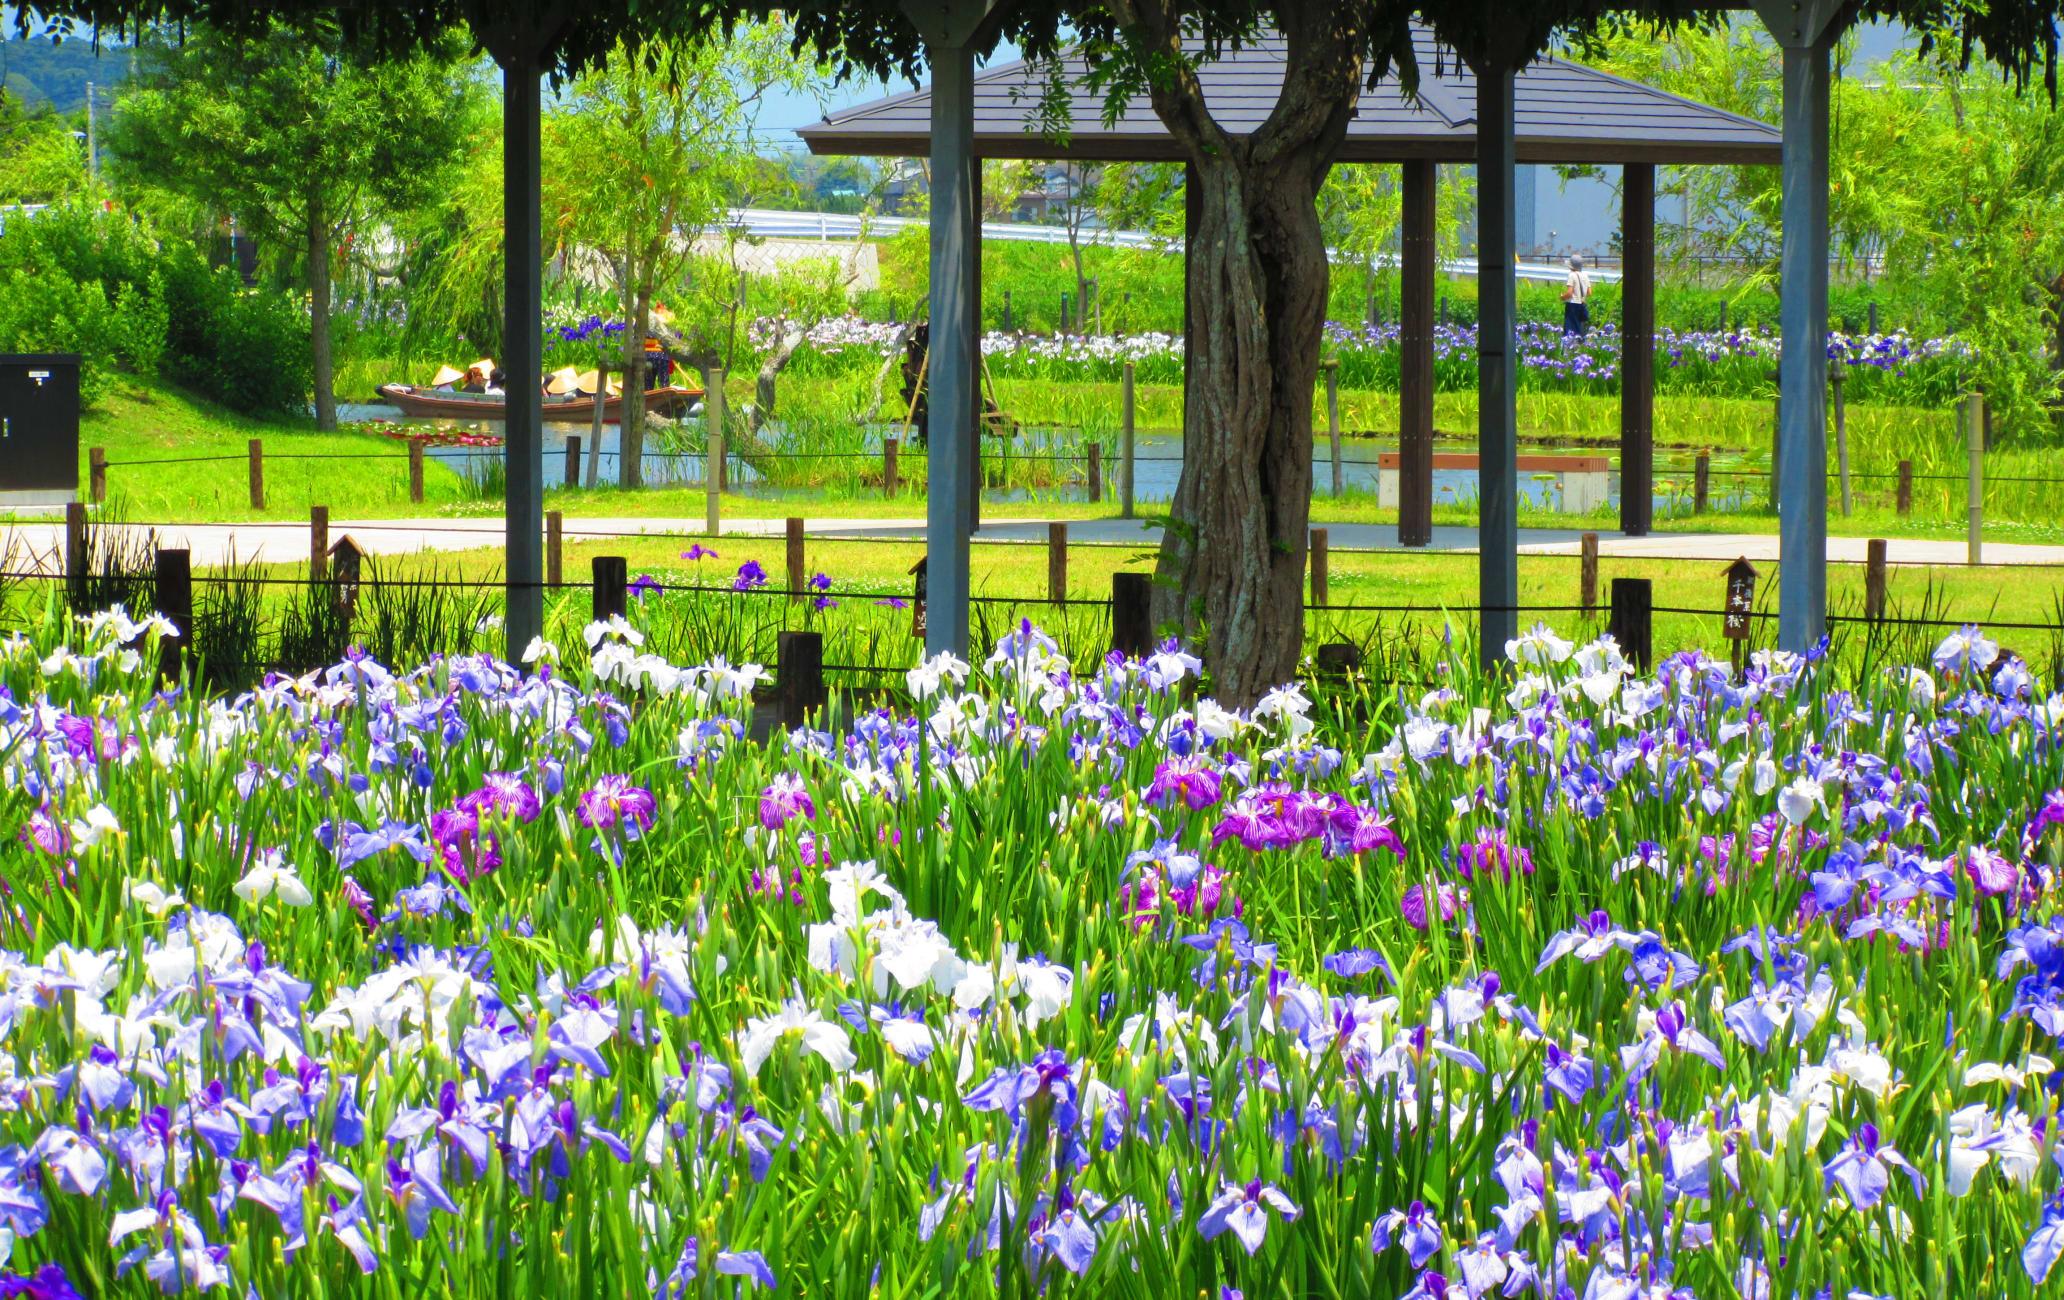 Suigo Sawara Aquatic Botanical Garden